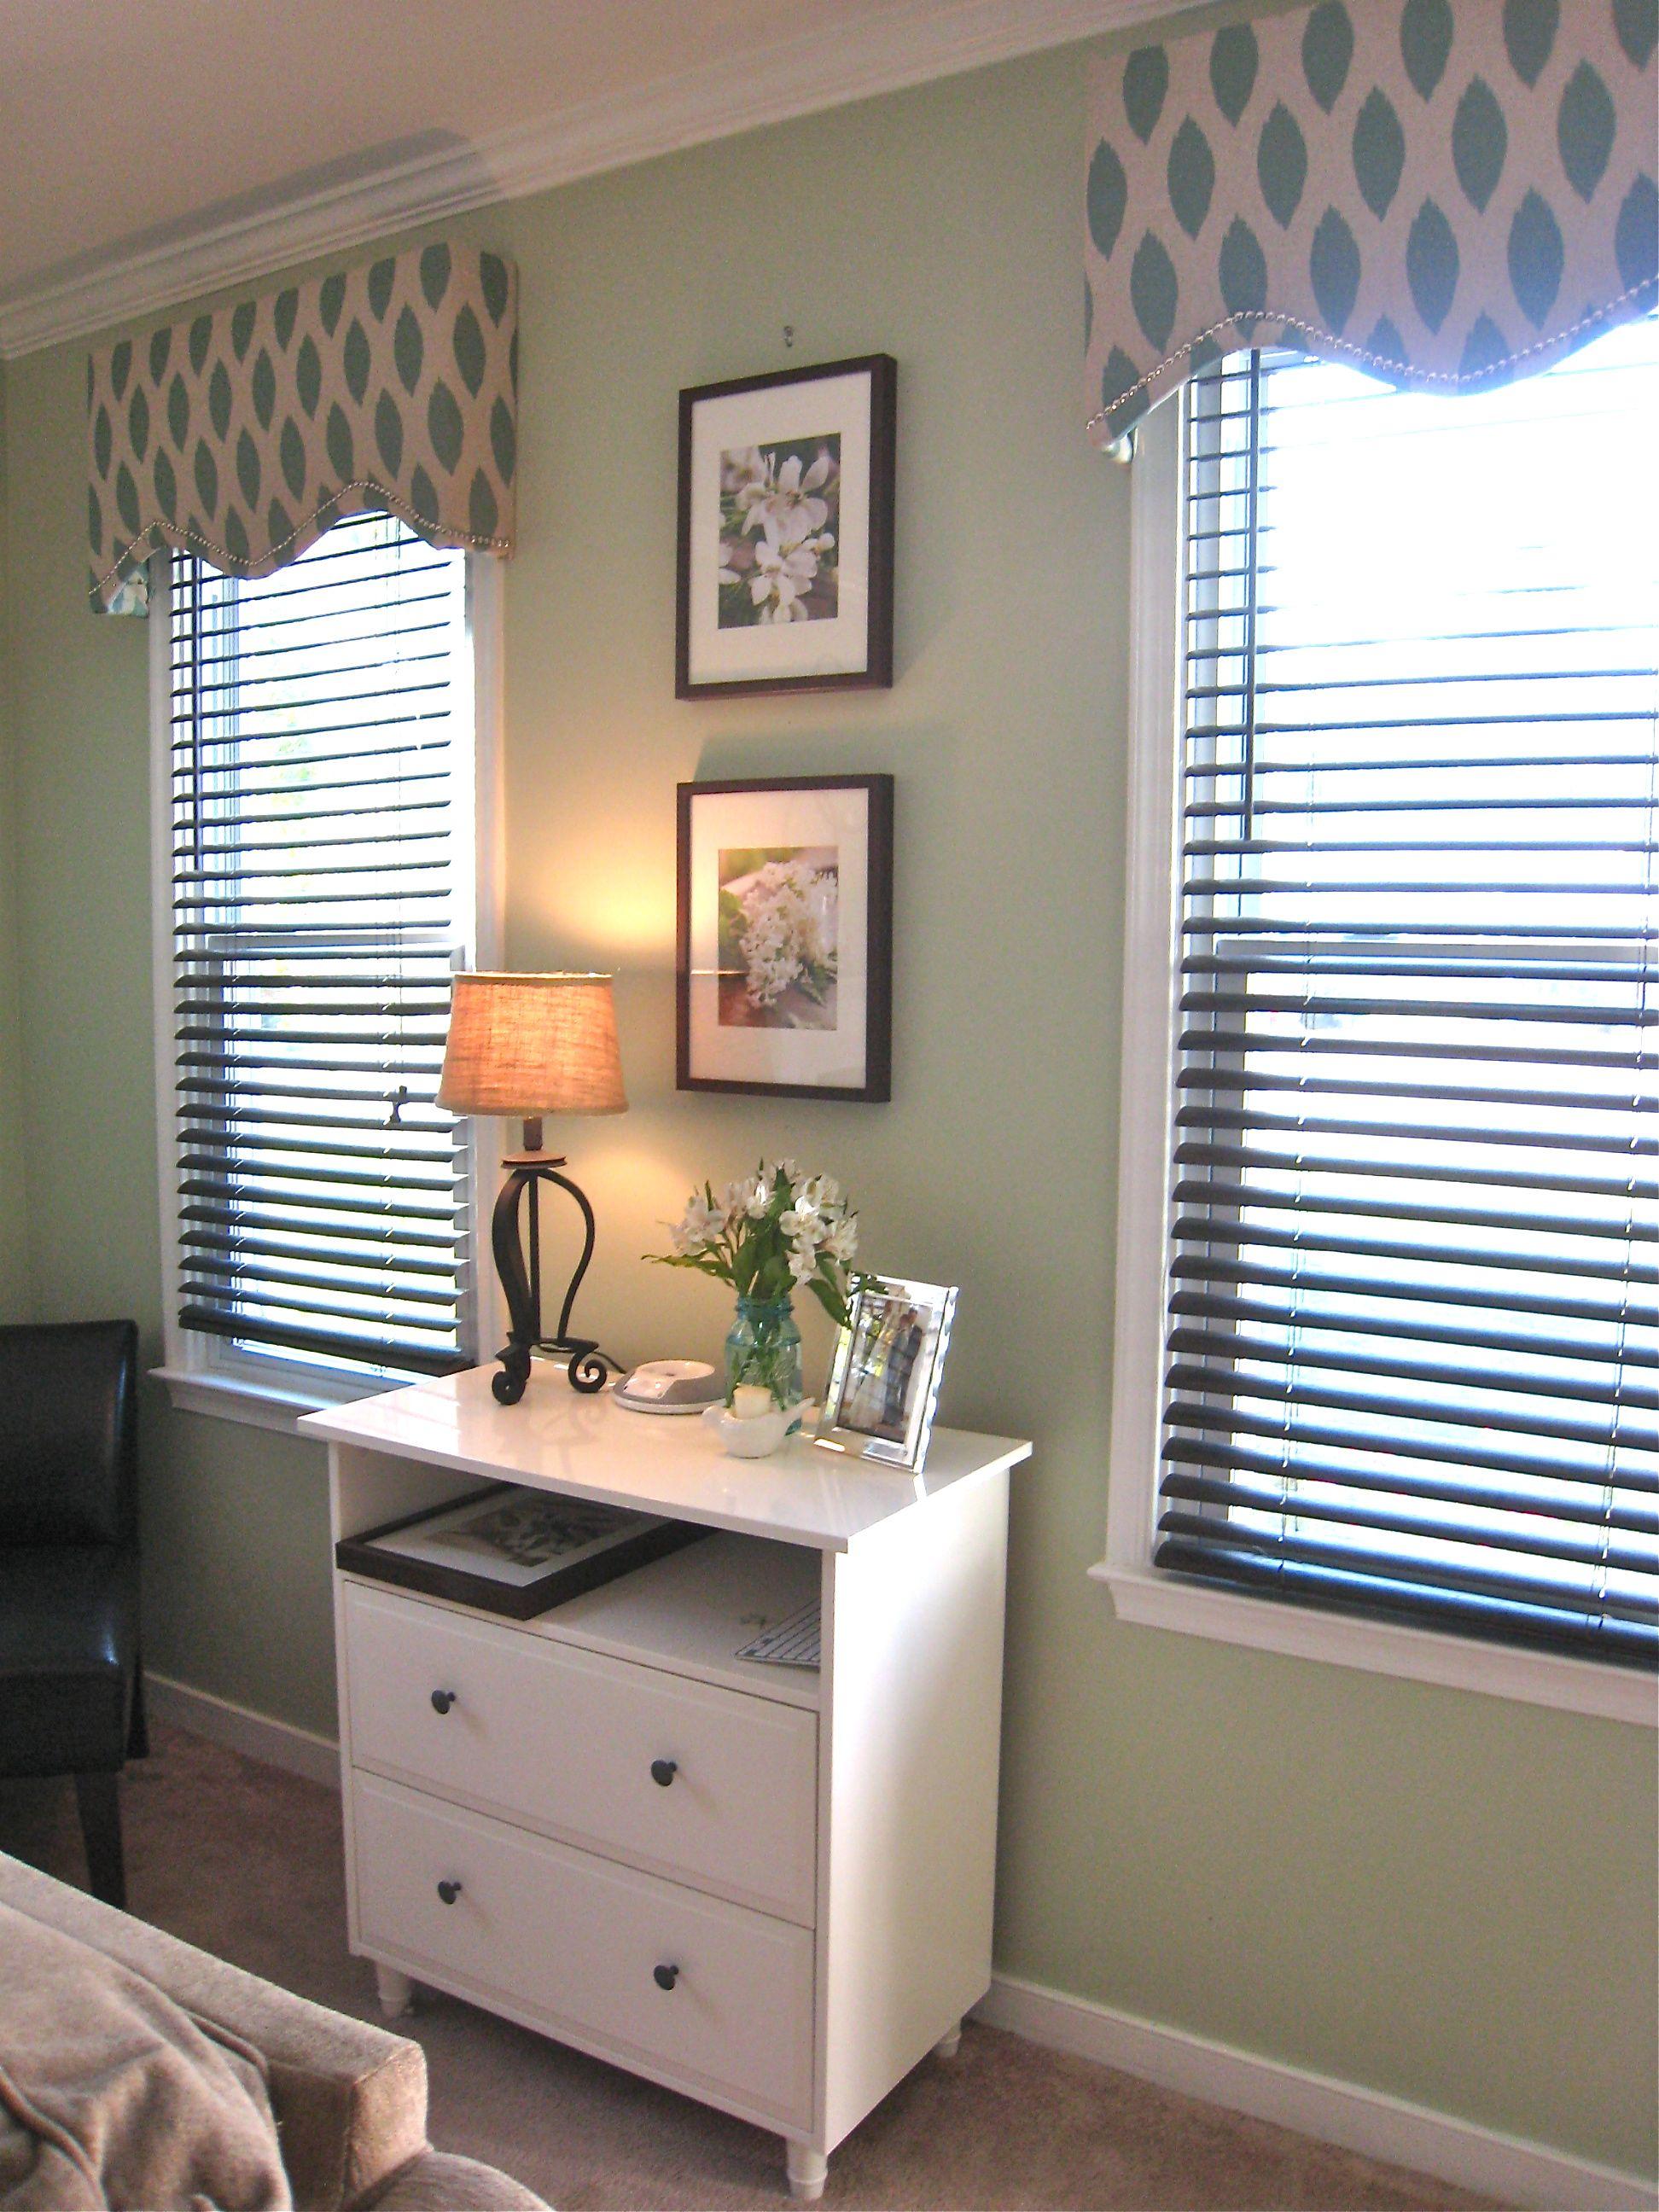 Diy pelmetcornice boxes diy window window cornices